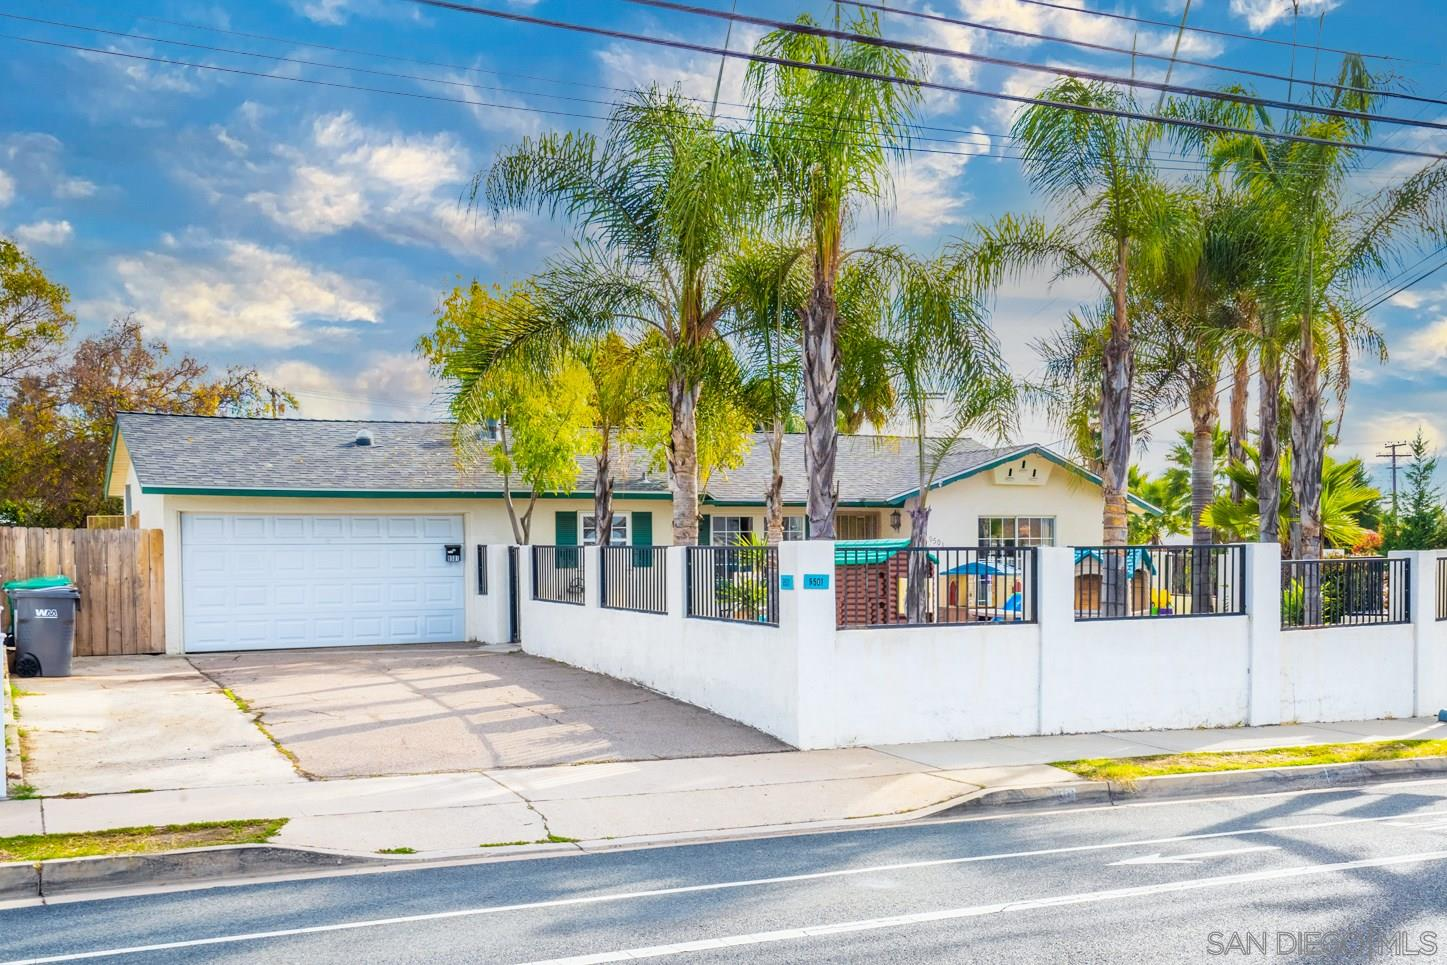 9501 Carlton Hills Blvd, Santee, CA 92071